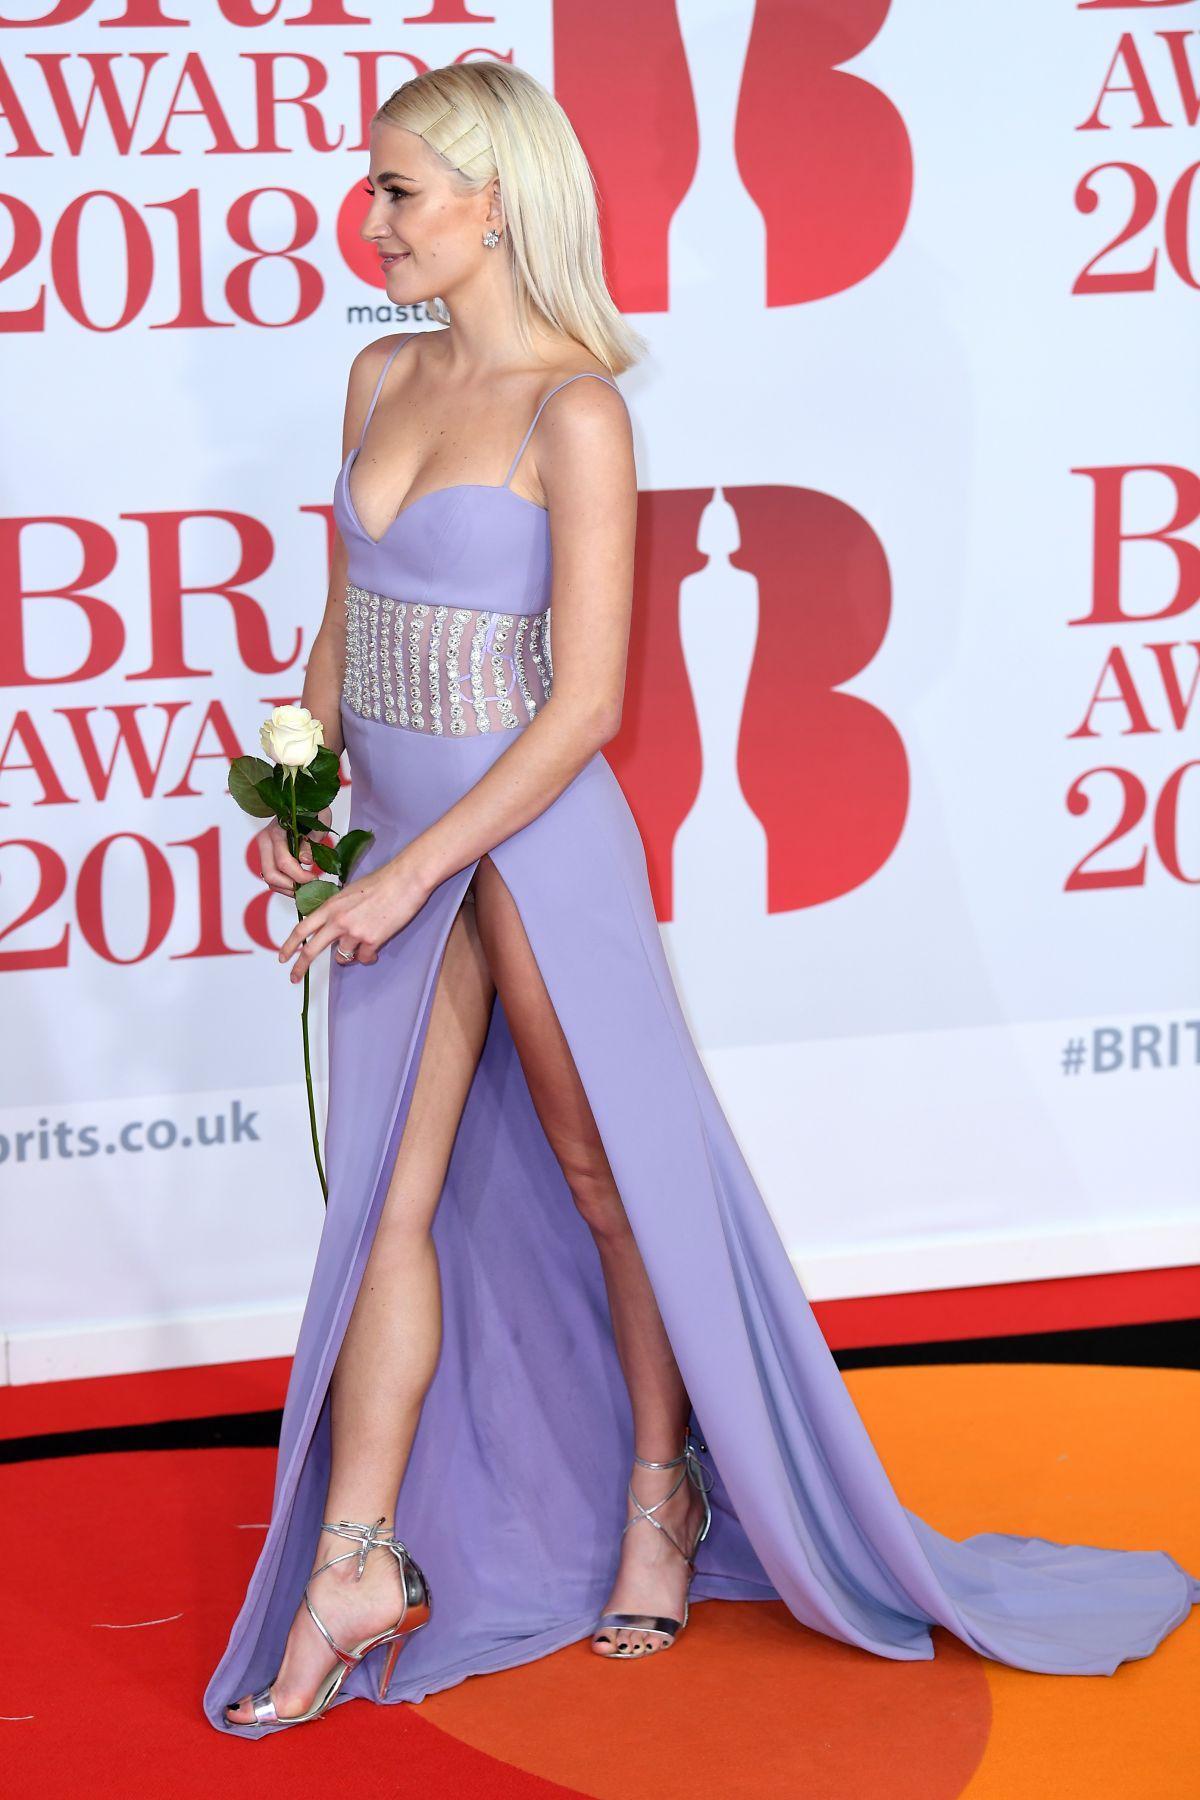 Britney spears ass show - 1 part 3